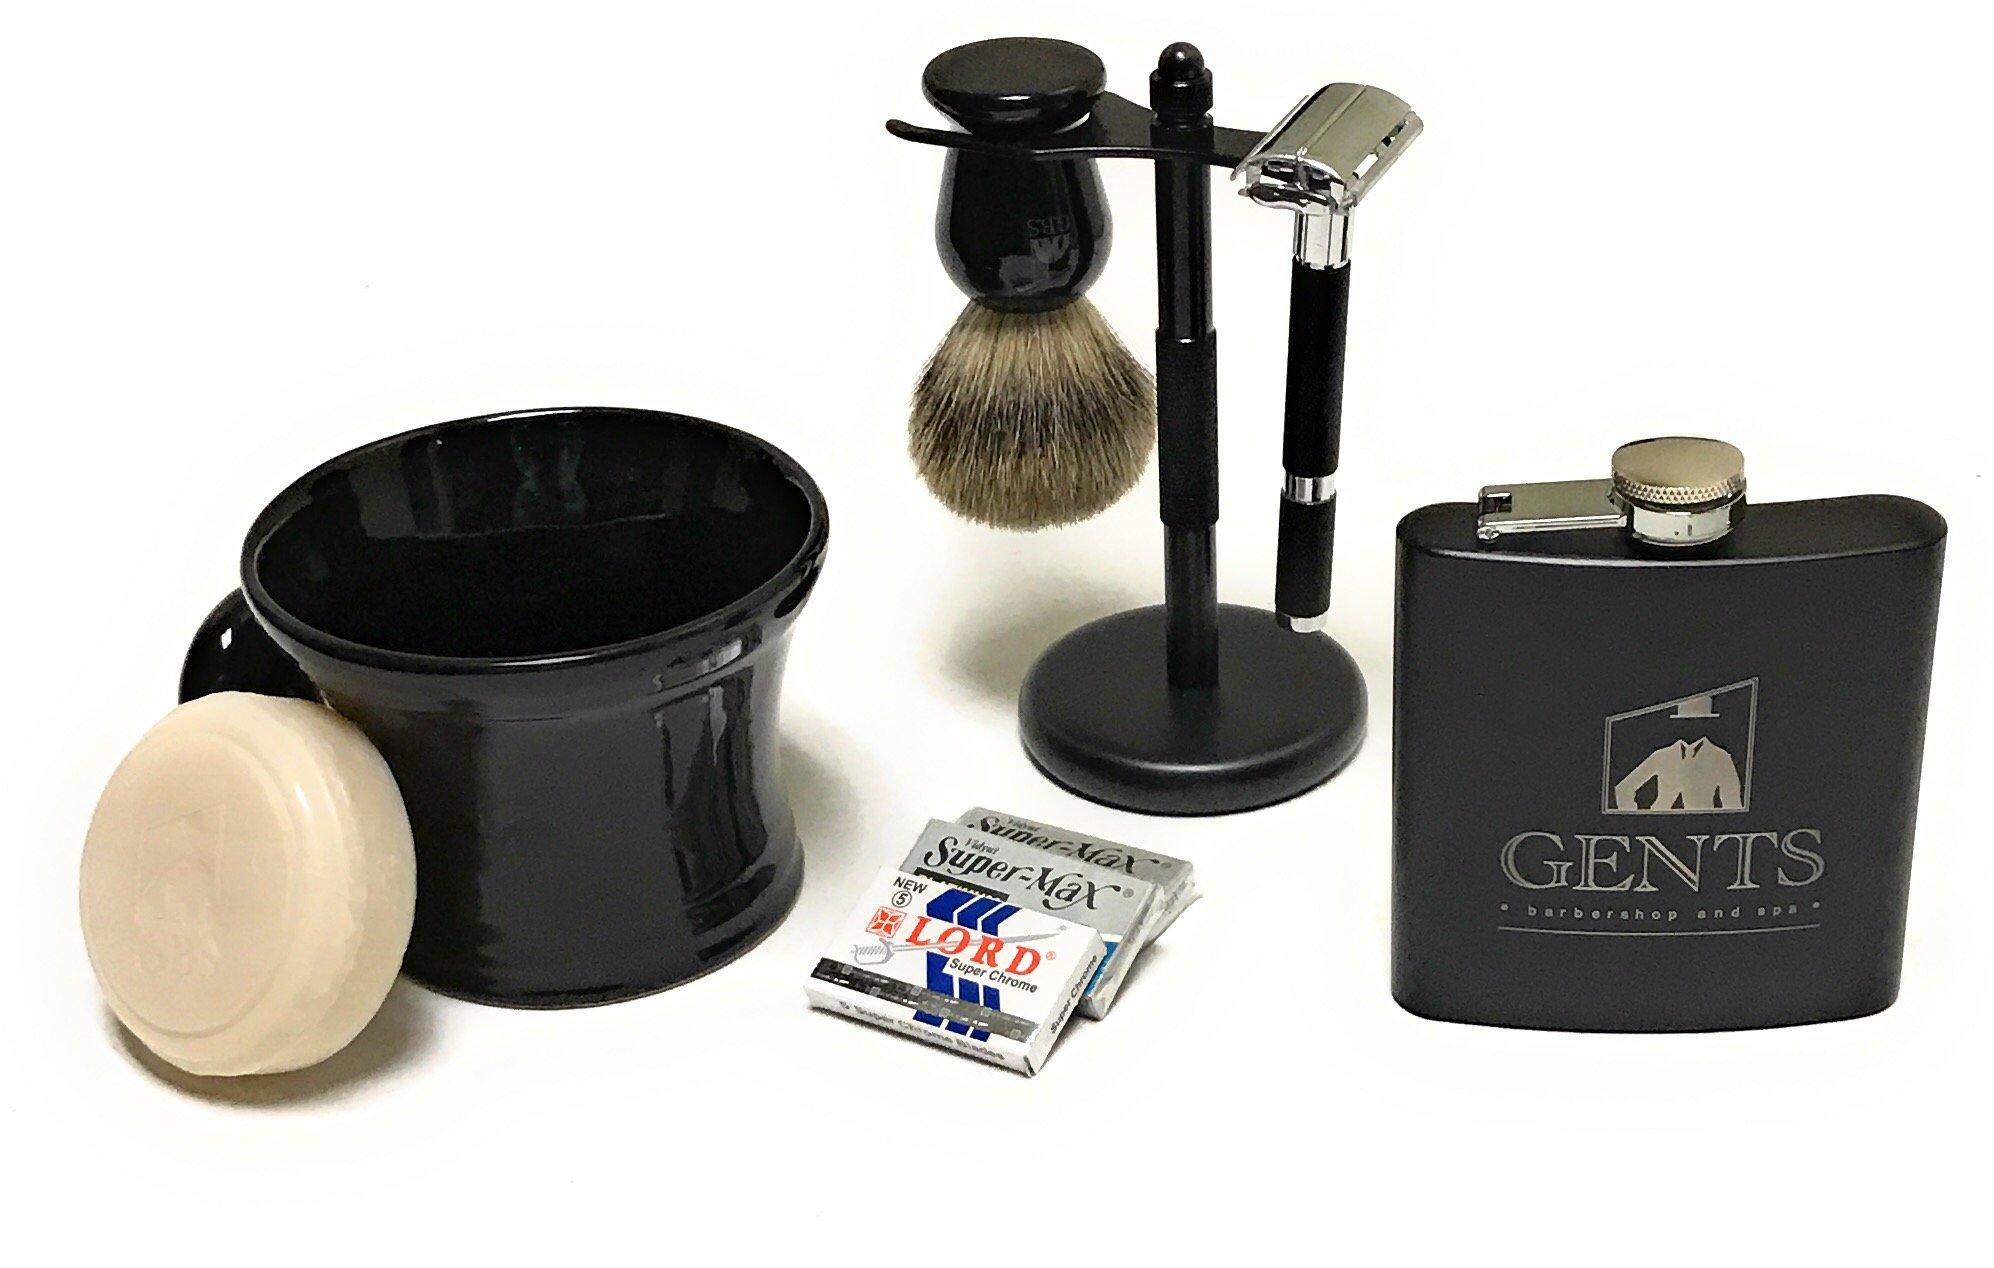 Long Handle Butterfly Safety Razor Set - Pure Badger Brush, Black Matte Stand, Ceramic Bowl and GBS 3 Oz Ocean Driftwood Shaving Soap +15 Blades & 6 oz Black Matte Flask